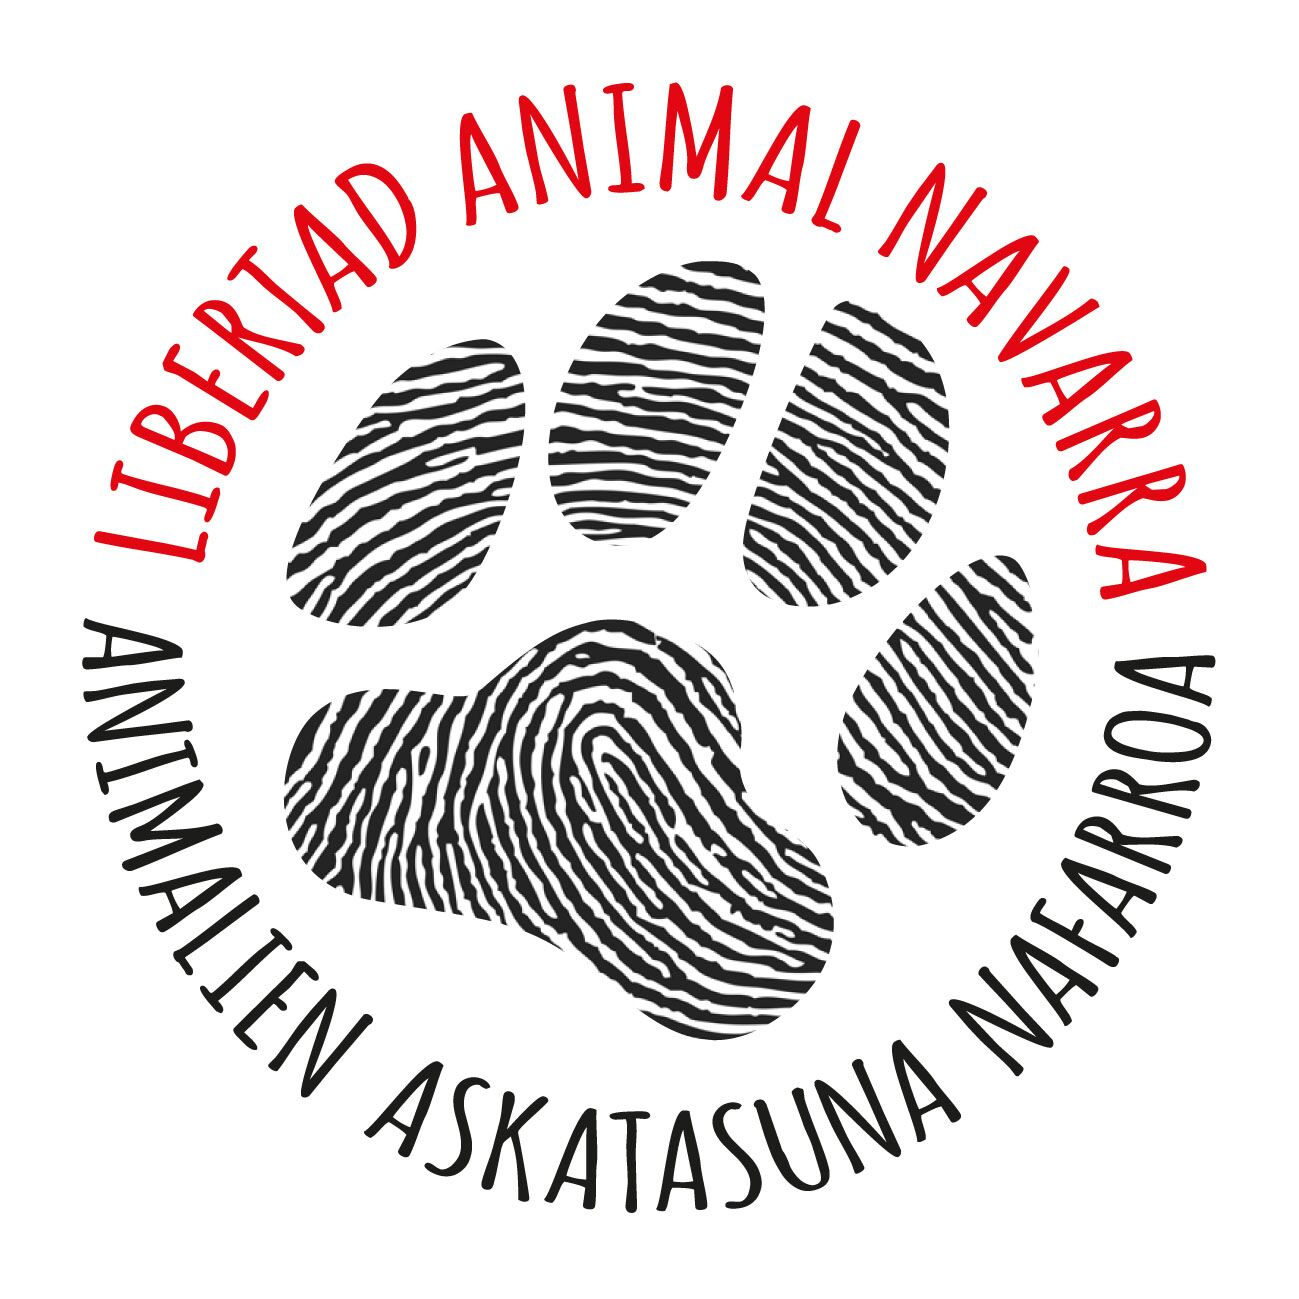 LIBERTAD ANIMAL NAVARRA - PAMPLONA - LOGO